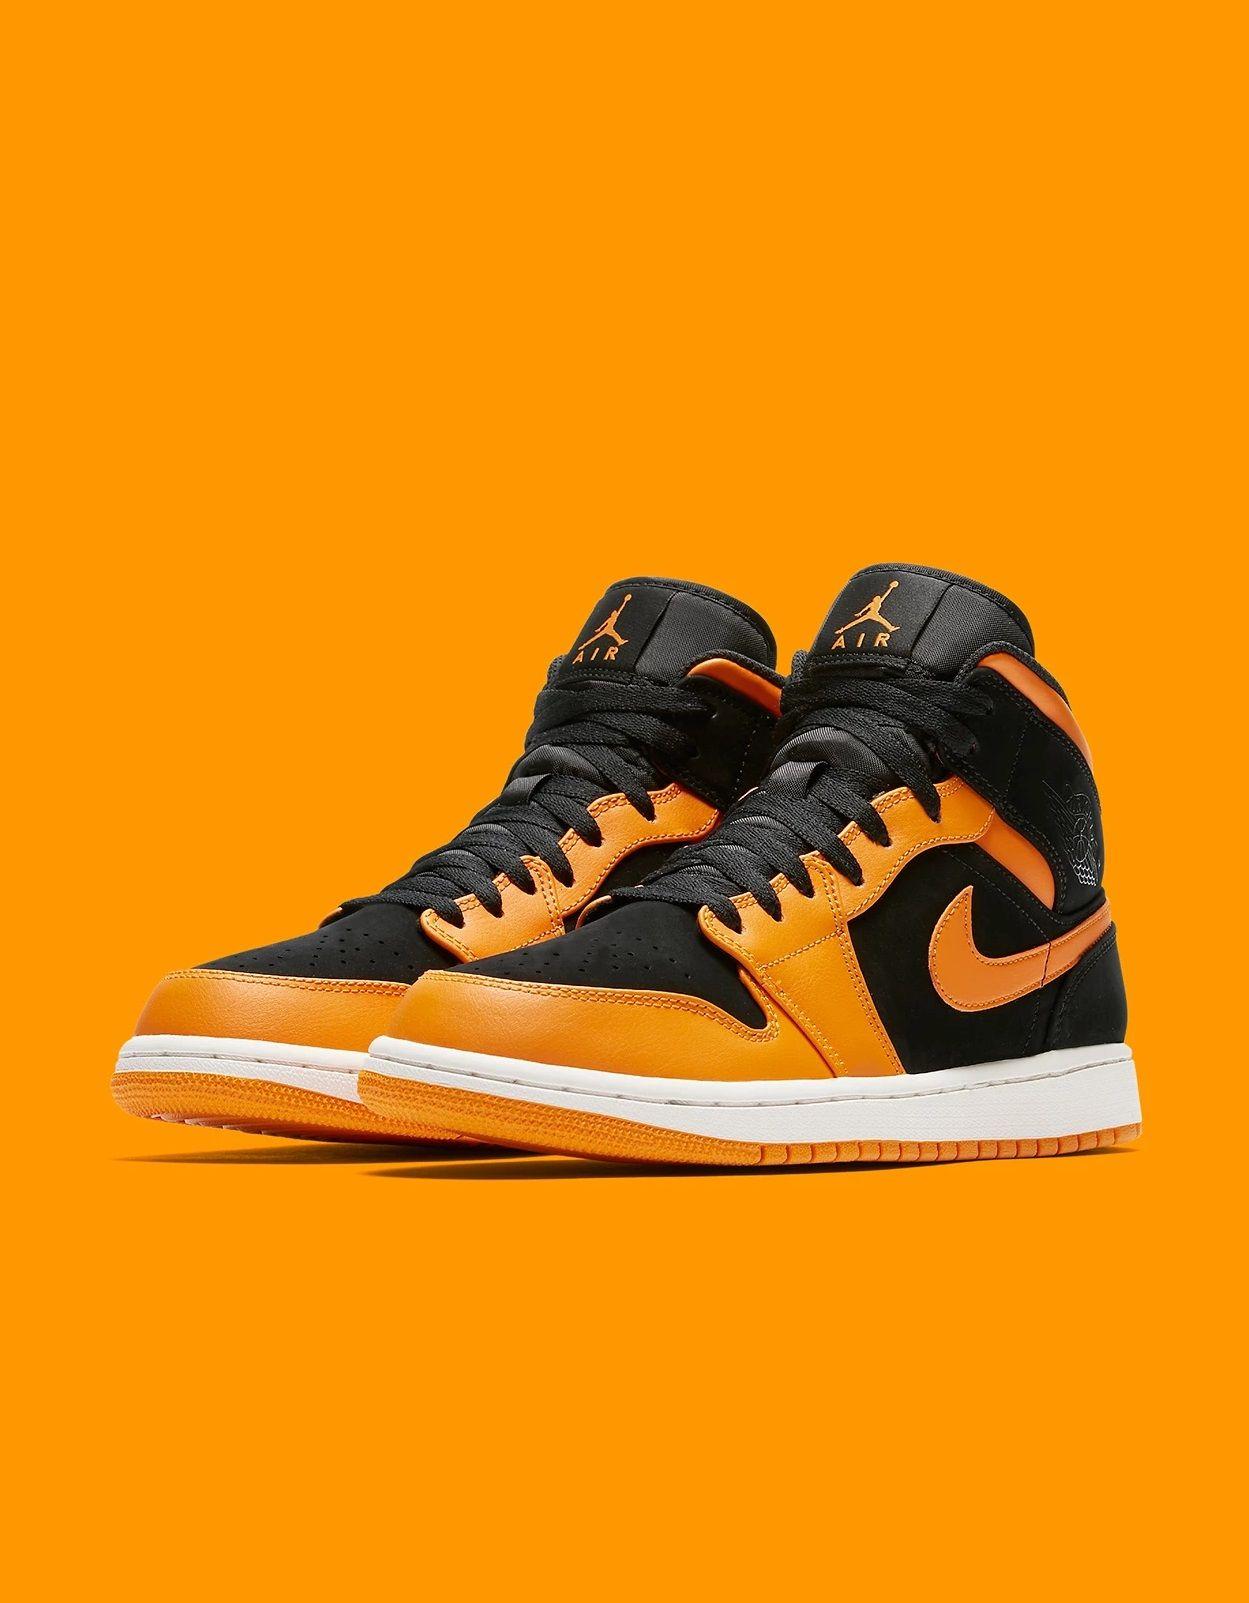 timeless design 5683f 581a9 Nike Air Jordan 1